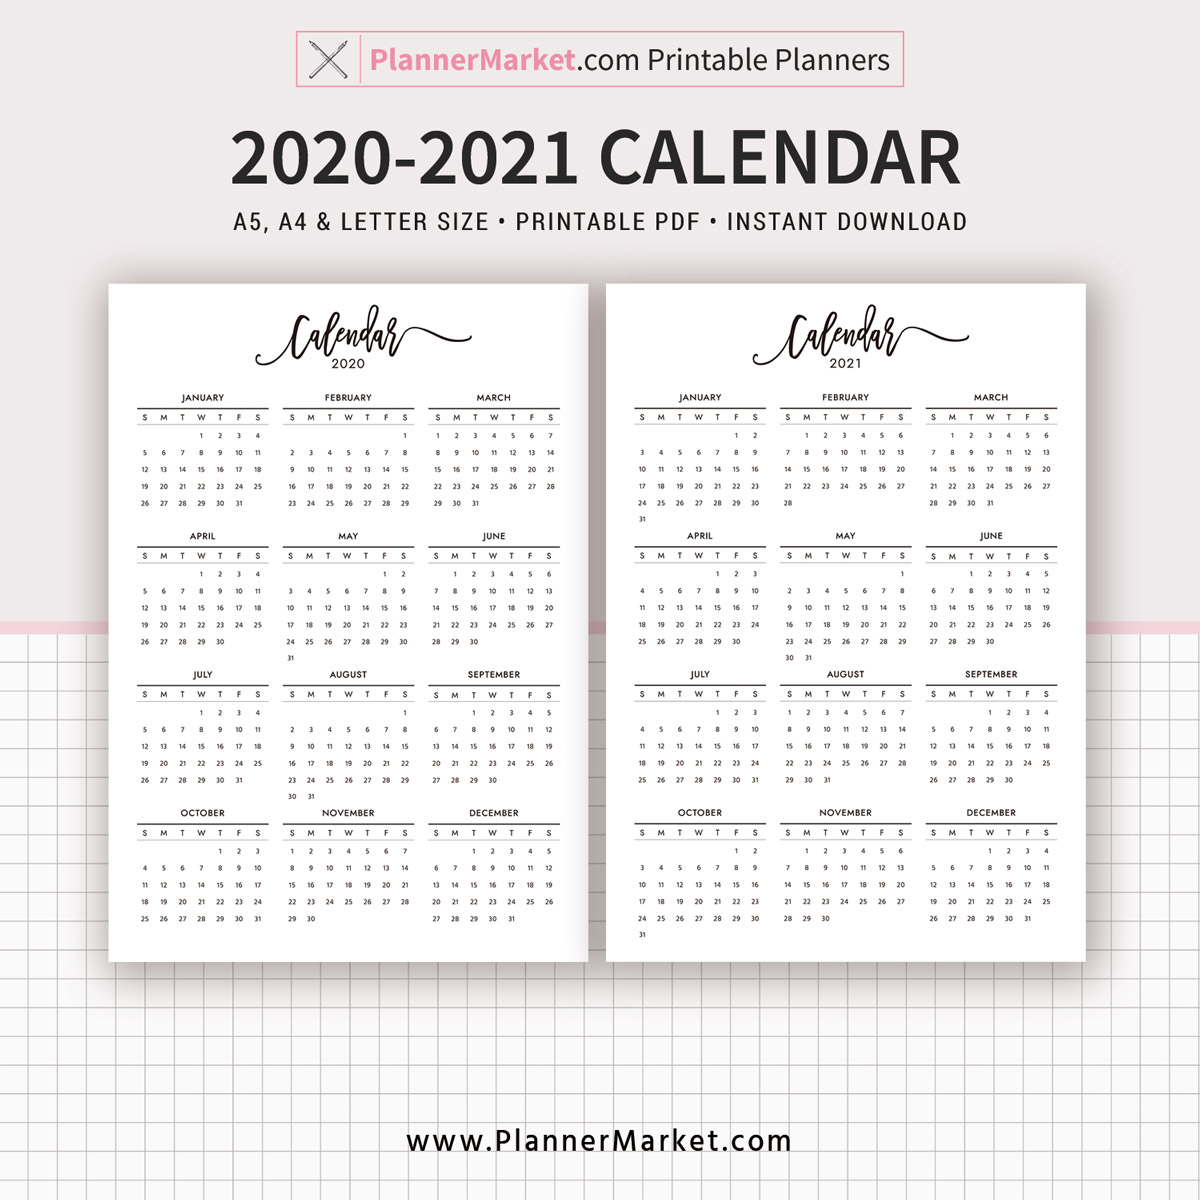 2020 2021 Calendar Printable Year At A Glance Filofax A5